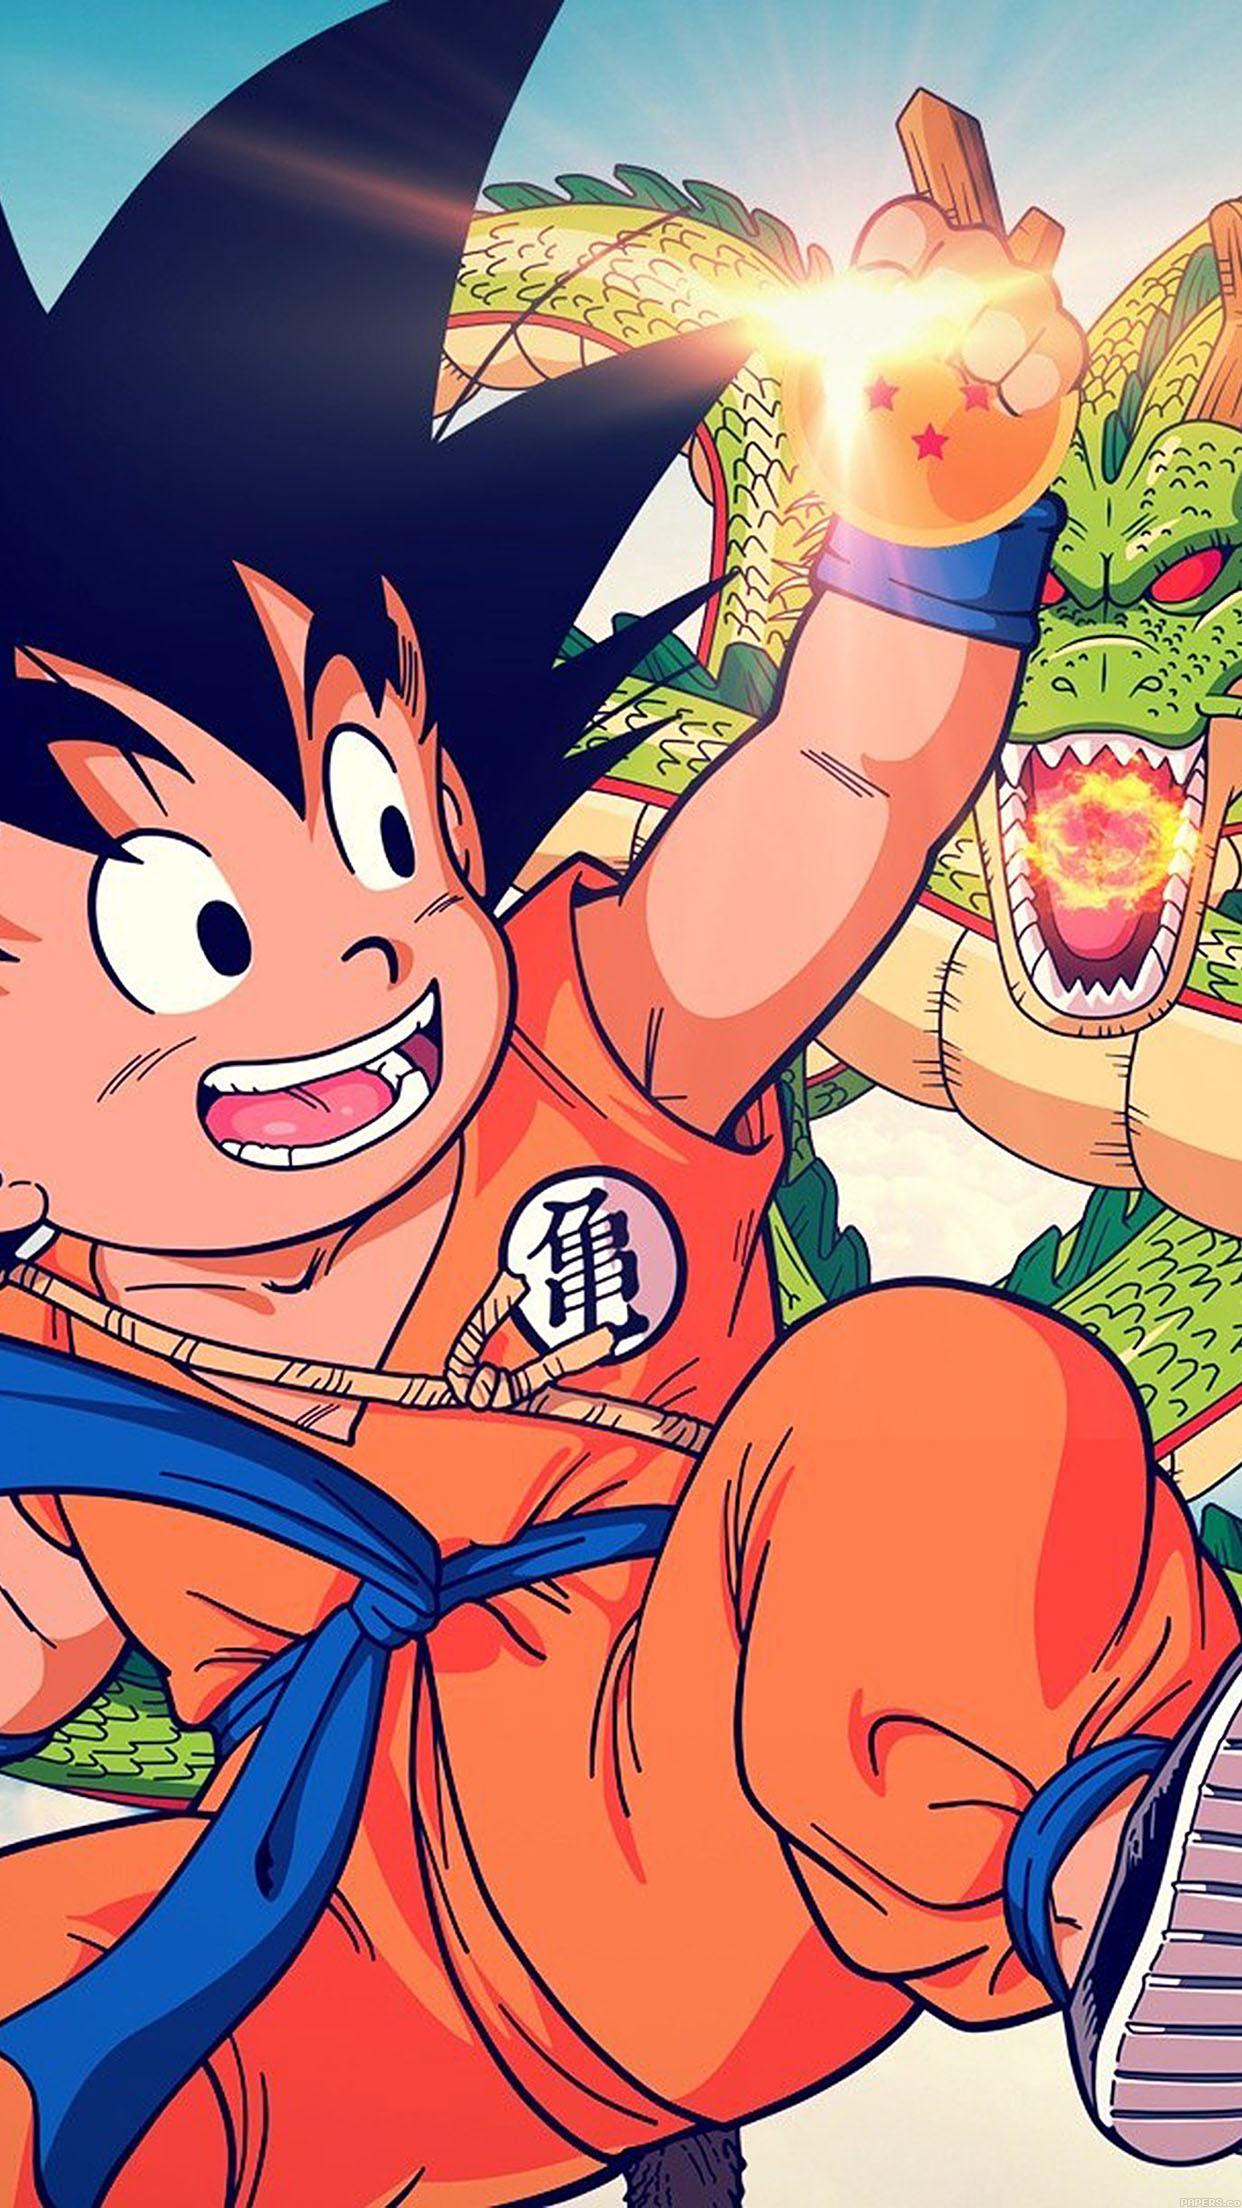 Iphone7papers Ab04 Wallpaper Goku Kid Dragonball Illust